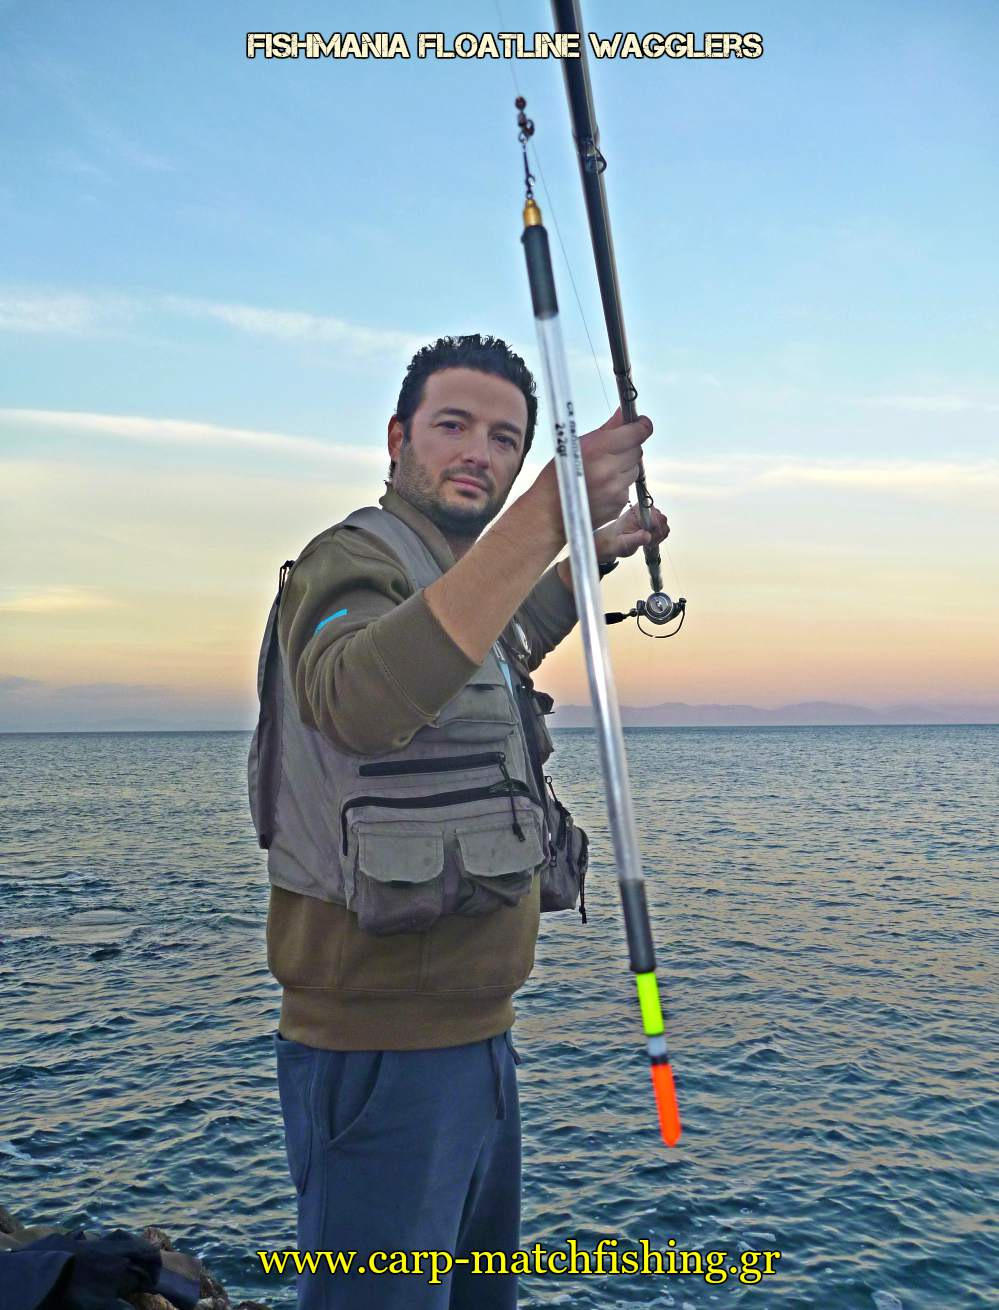 staright-wagglers-sfaltos-carpmatchfishing